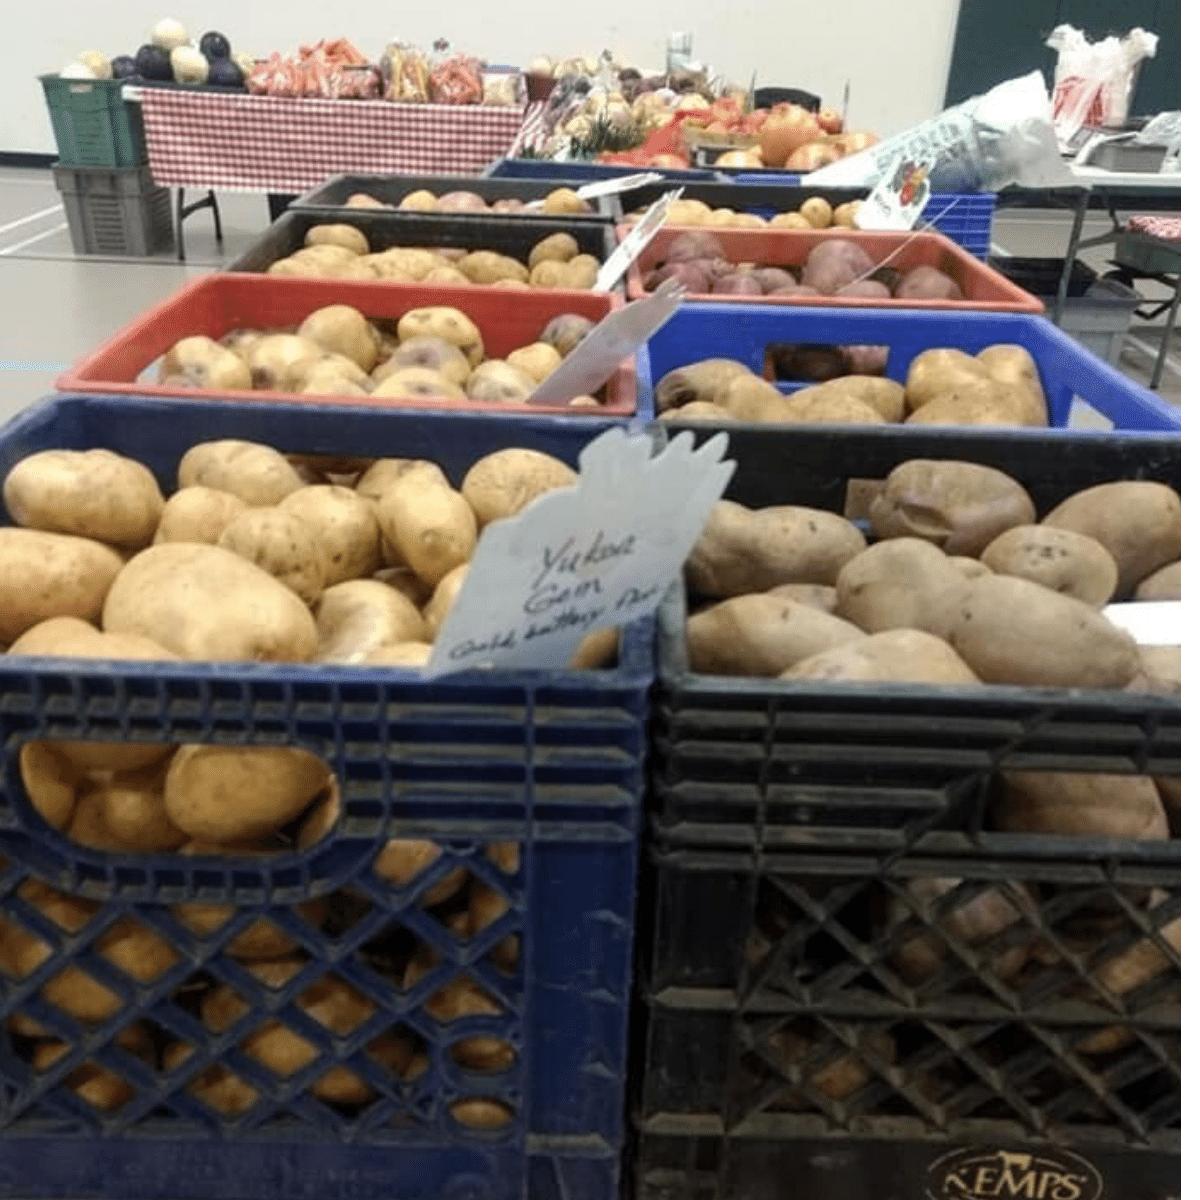 Adirondack Blue Potatoes, 5 lb